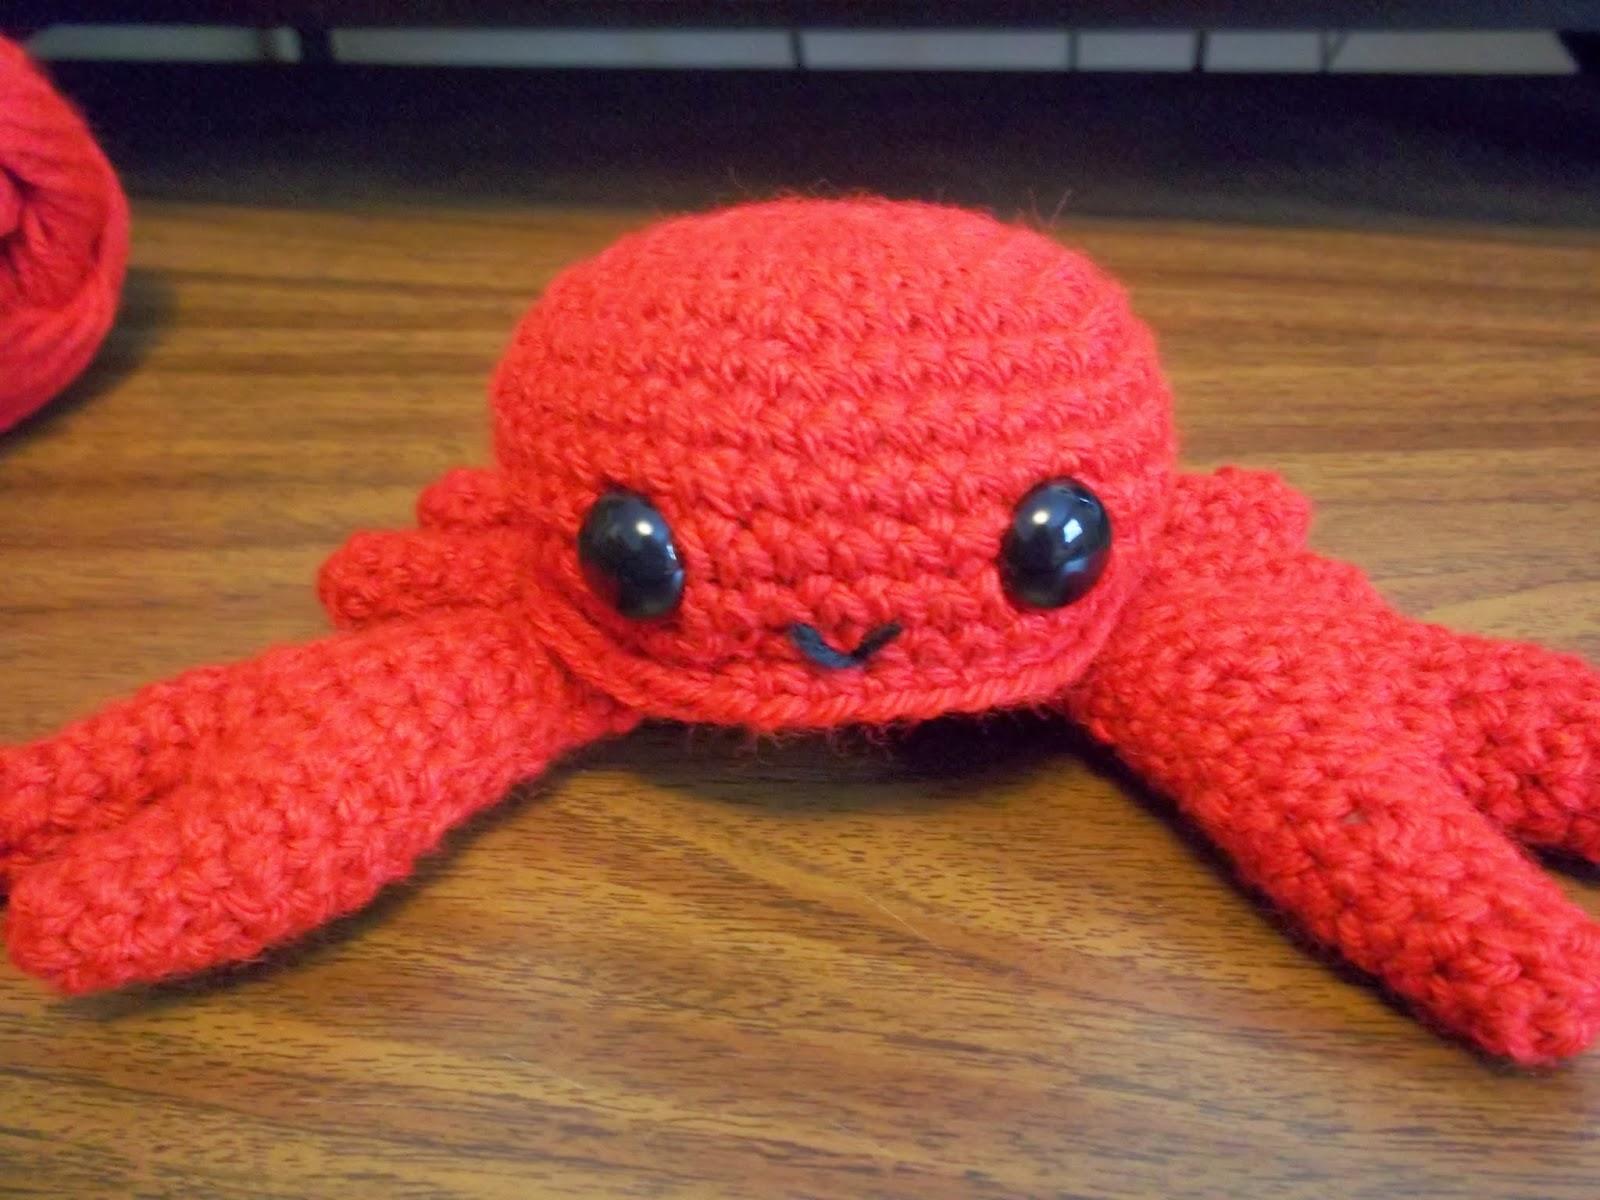 Amigurumi Crab : Eden is only a dream away: Crochet Crab Amigurumi Pattern